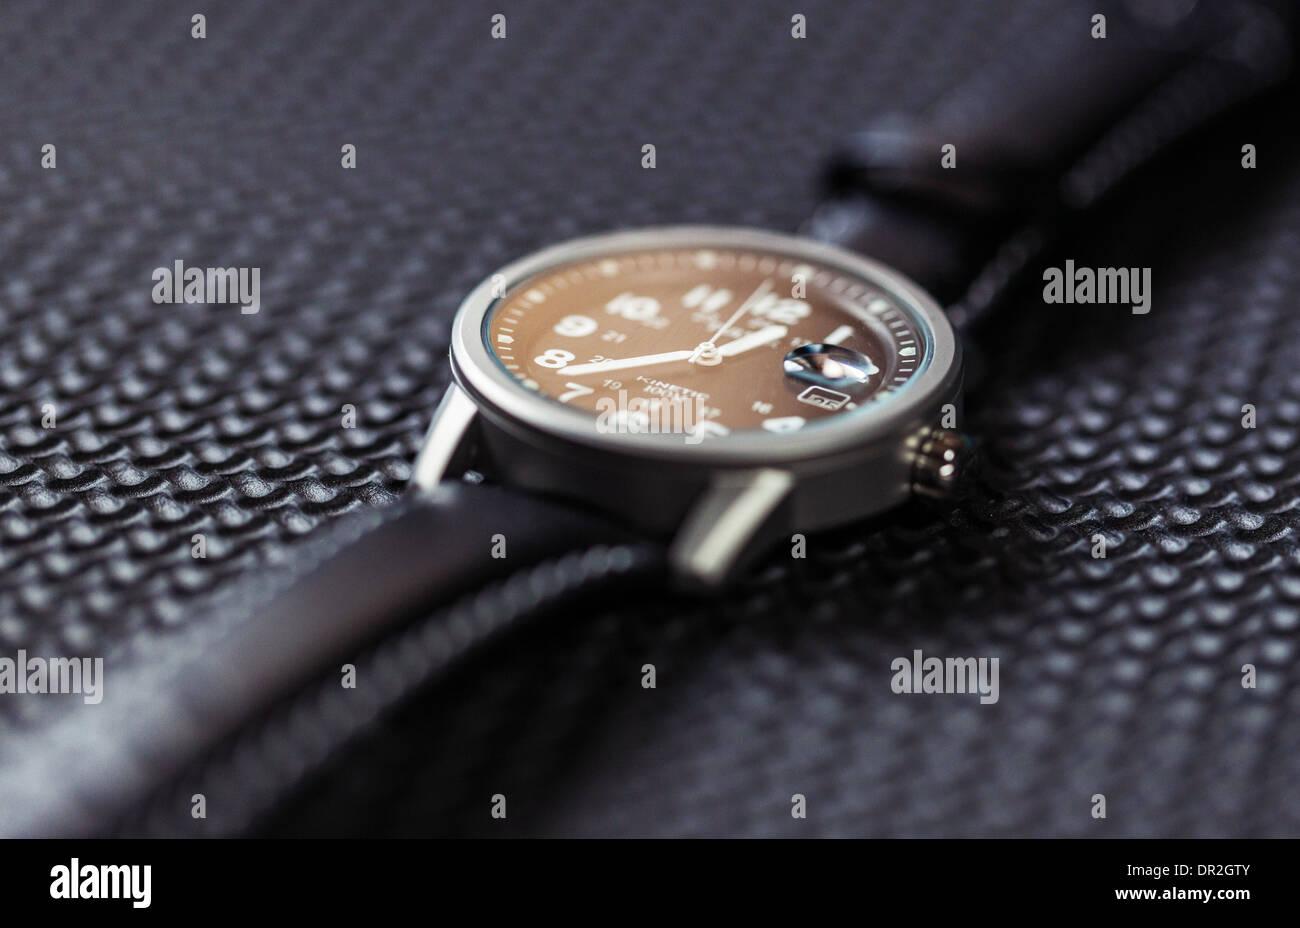 Men's wrist watch - Stock Image